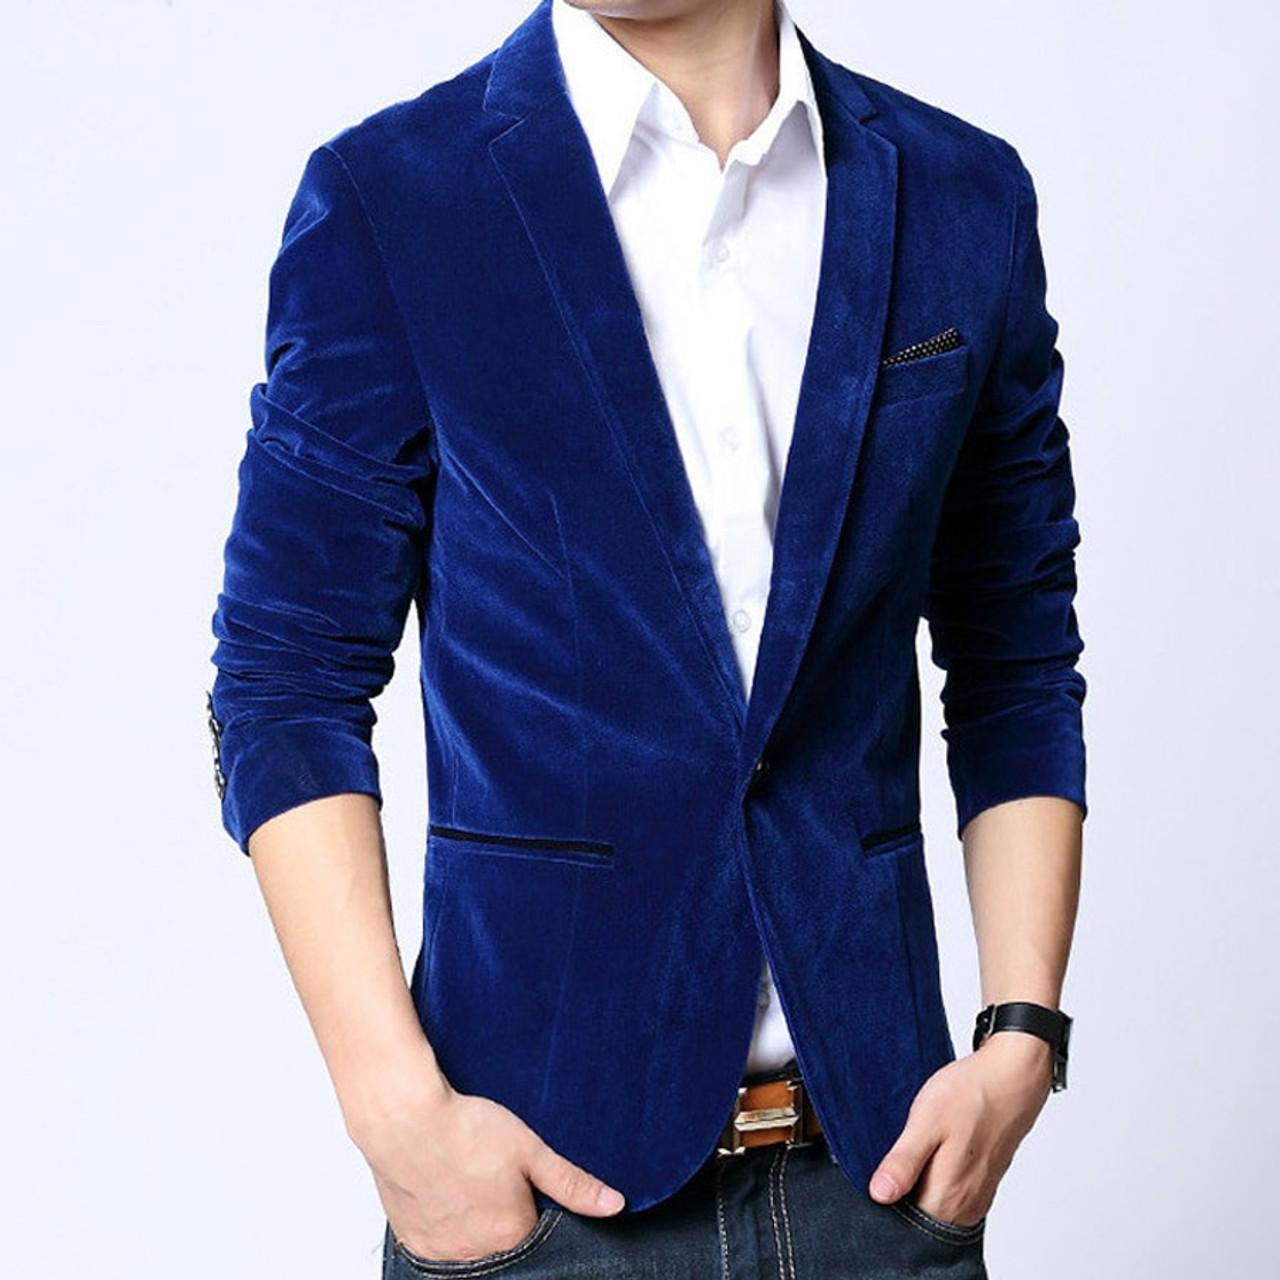 dbc89e12e194 ... Mens blazer slim fit suit jacket black dark blue velvet 2019 spring  autumn outwear coat Free ...